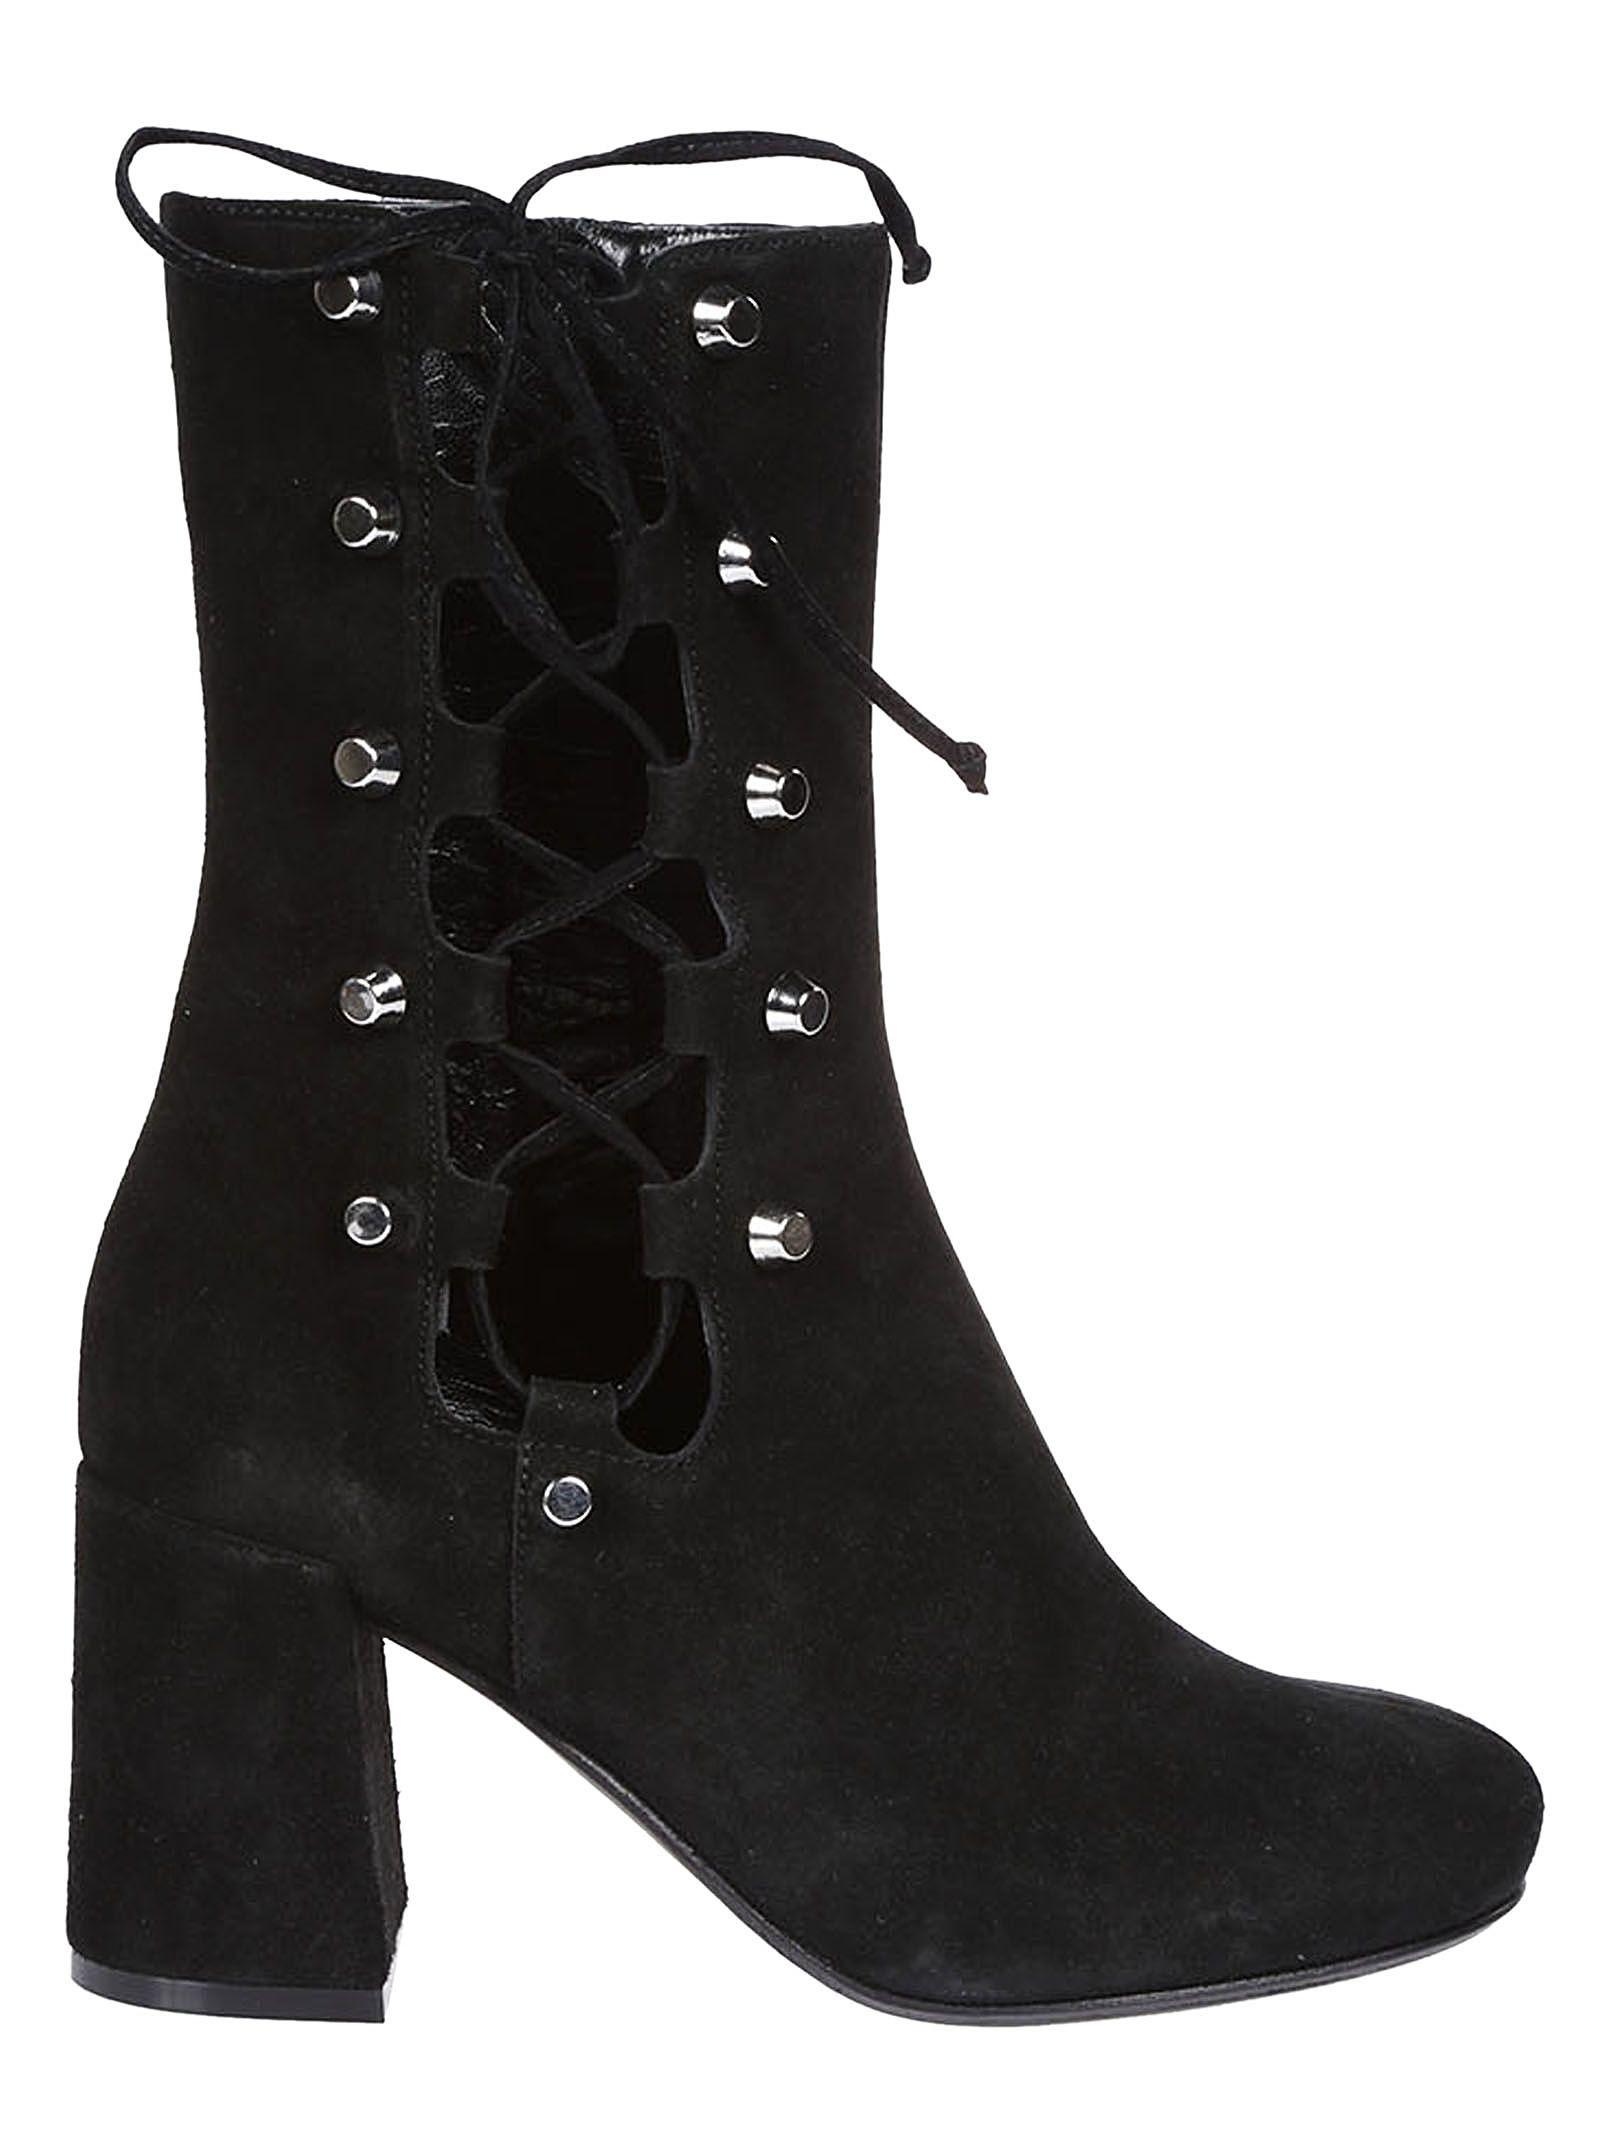 Mcq Alexander Mcqueen Side Lace Pembury Boots